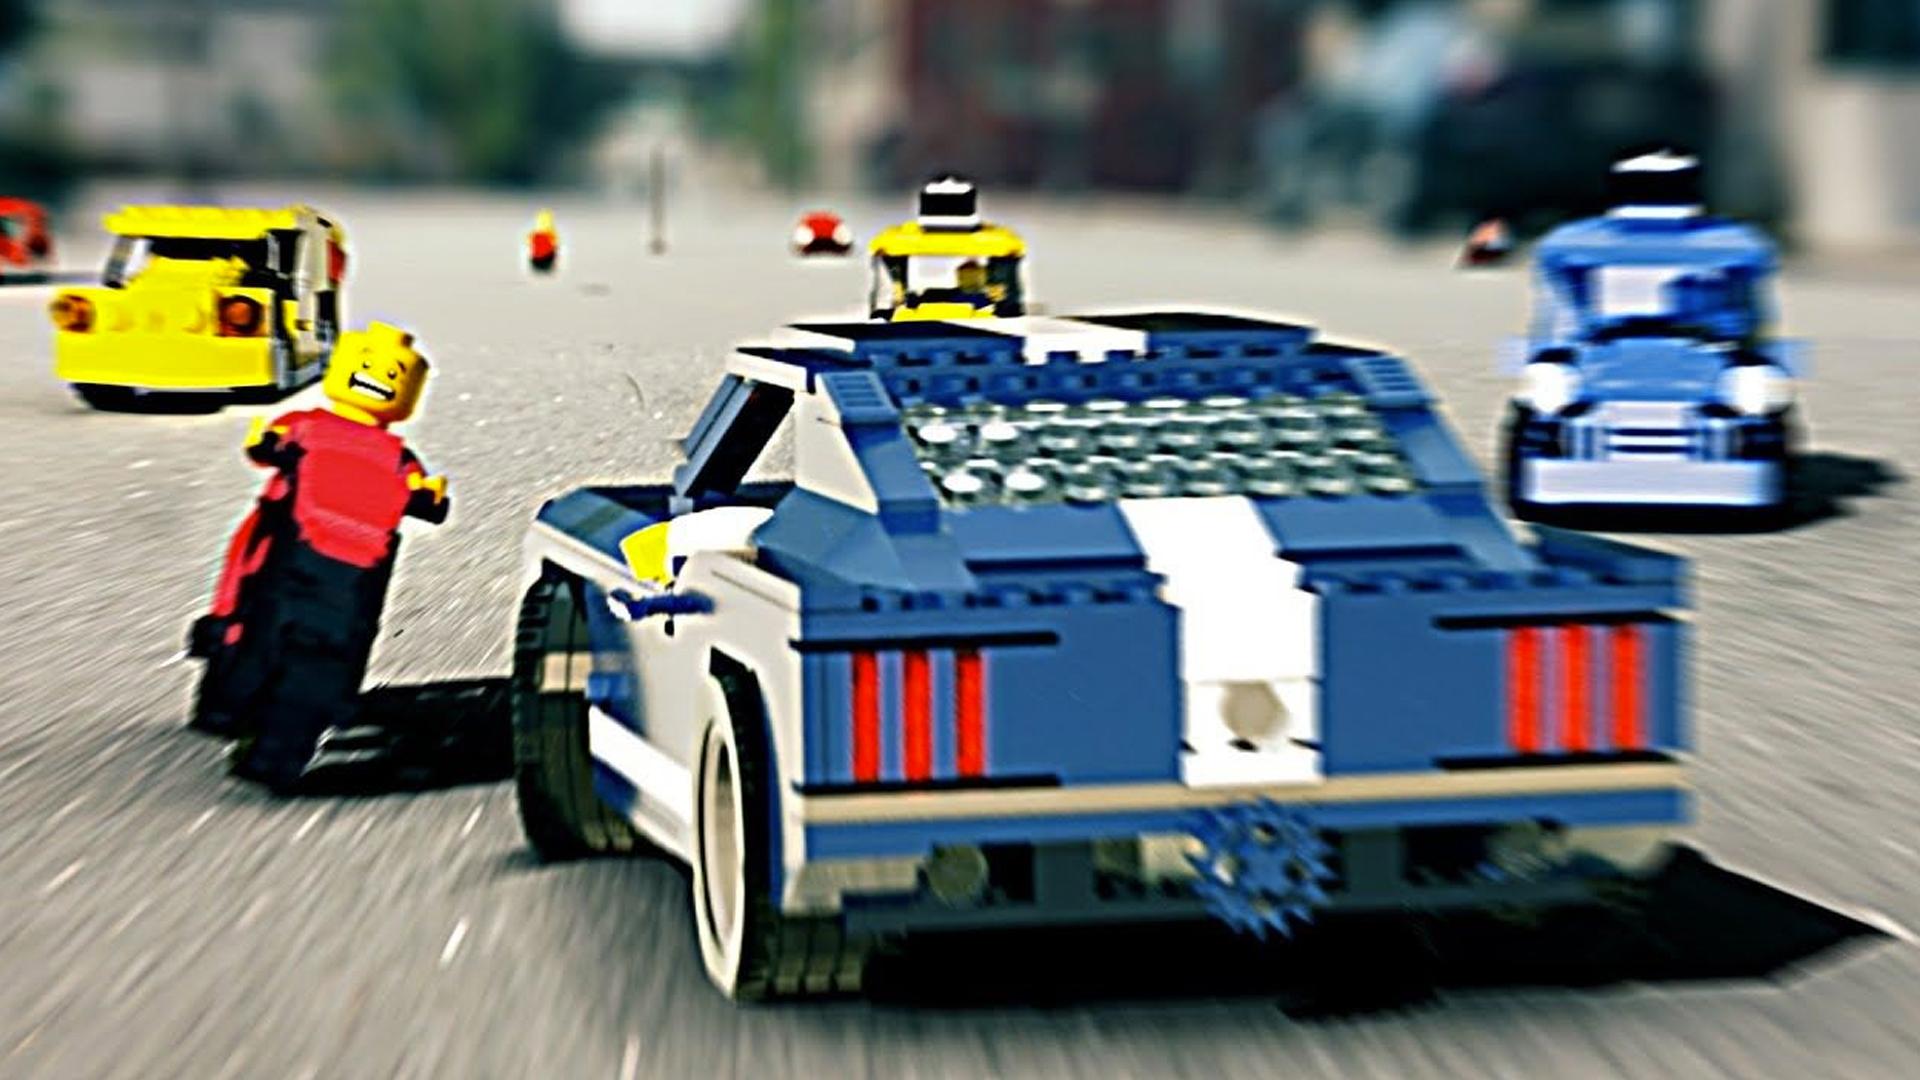 This Lego Grand Theft Auto Short Film Is Pretty Damn Funny Geektyrant